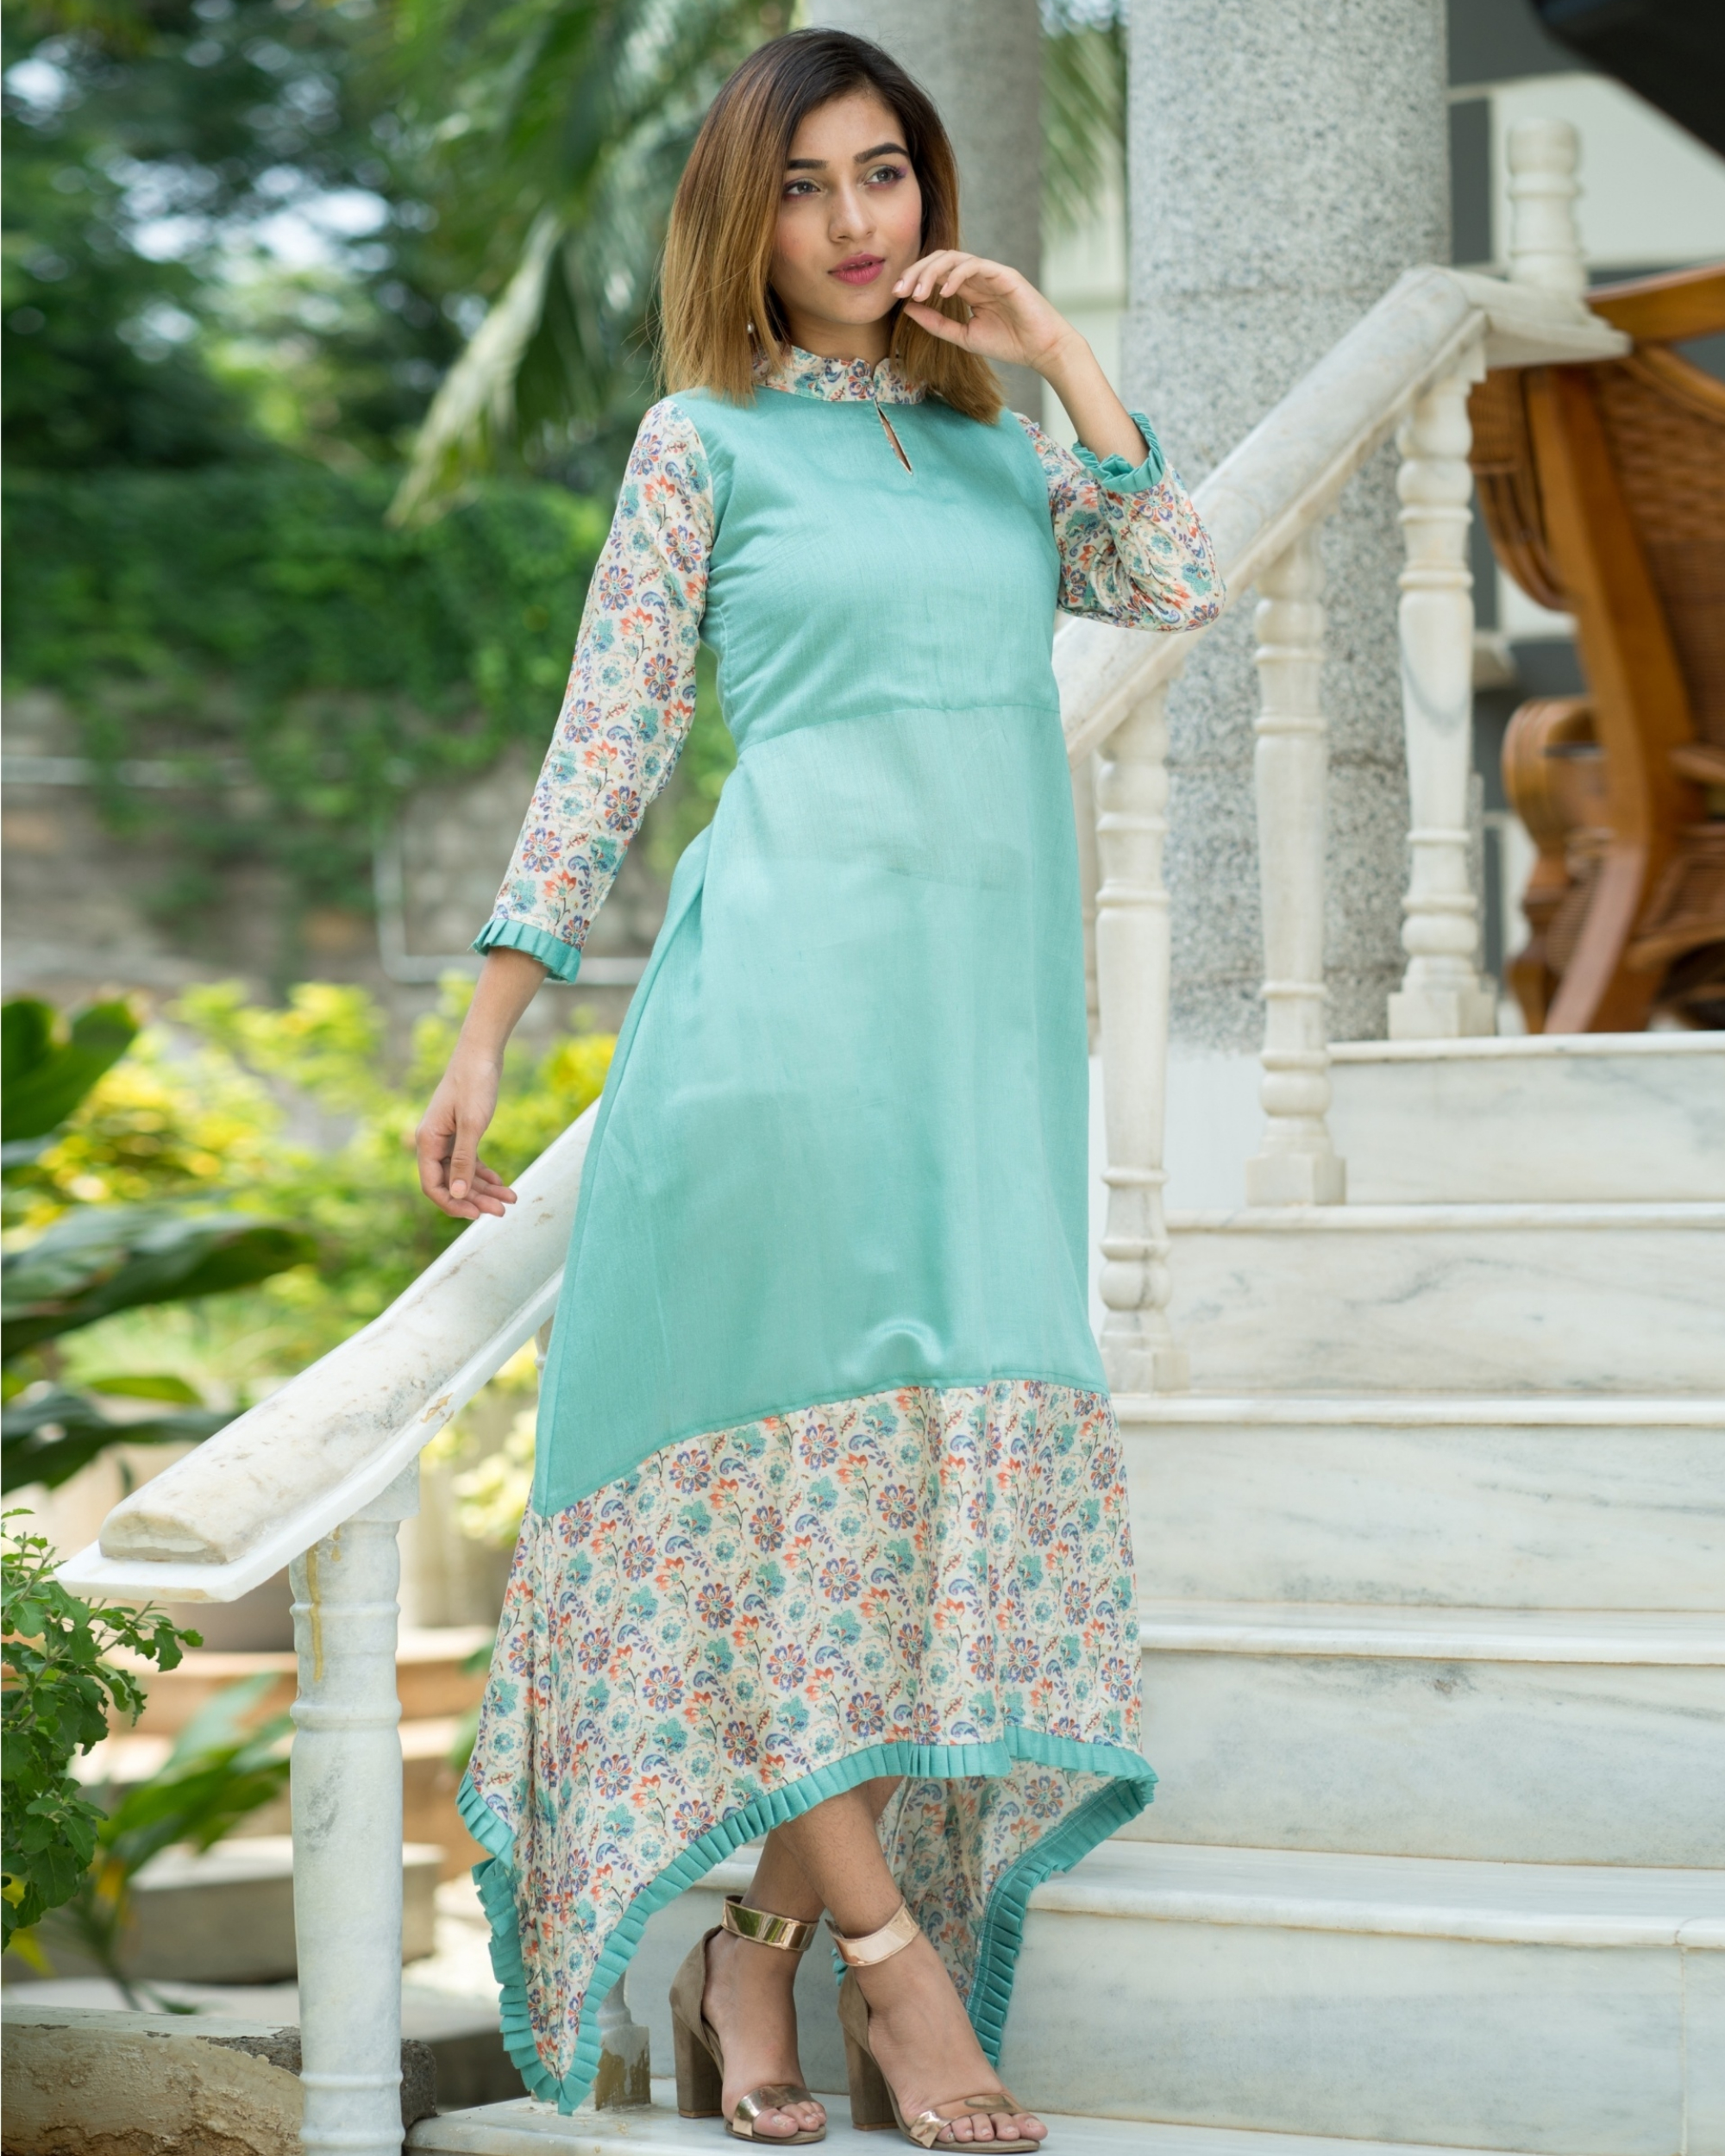 Aqua blue asymmetrical dress